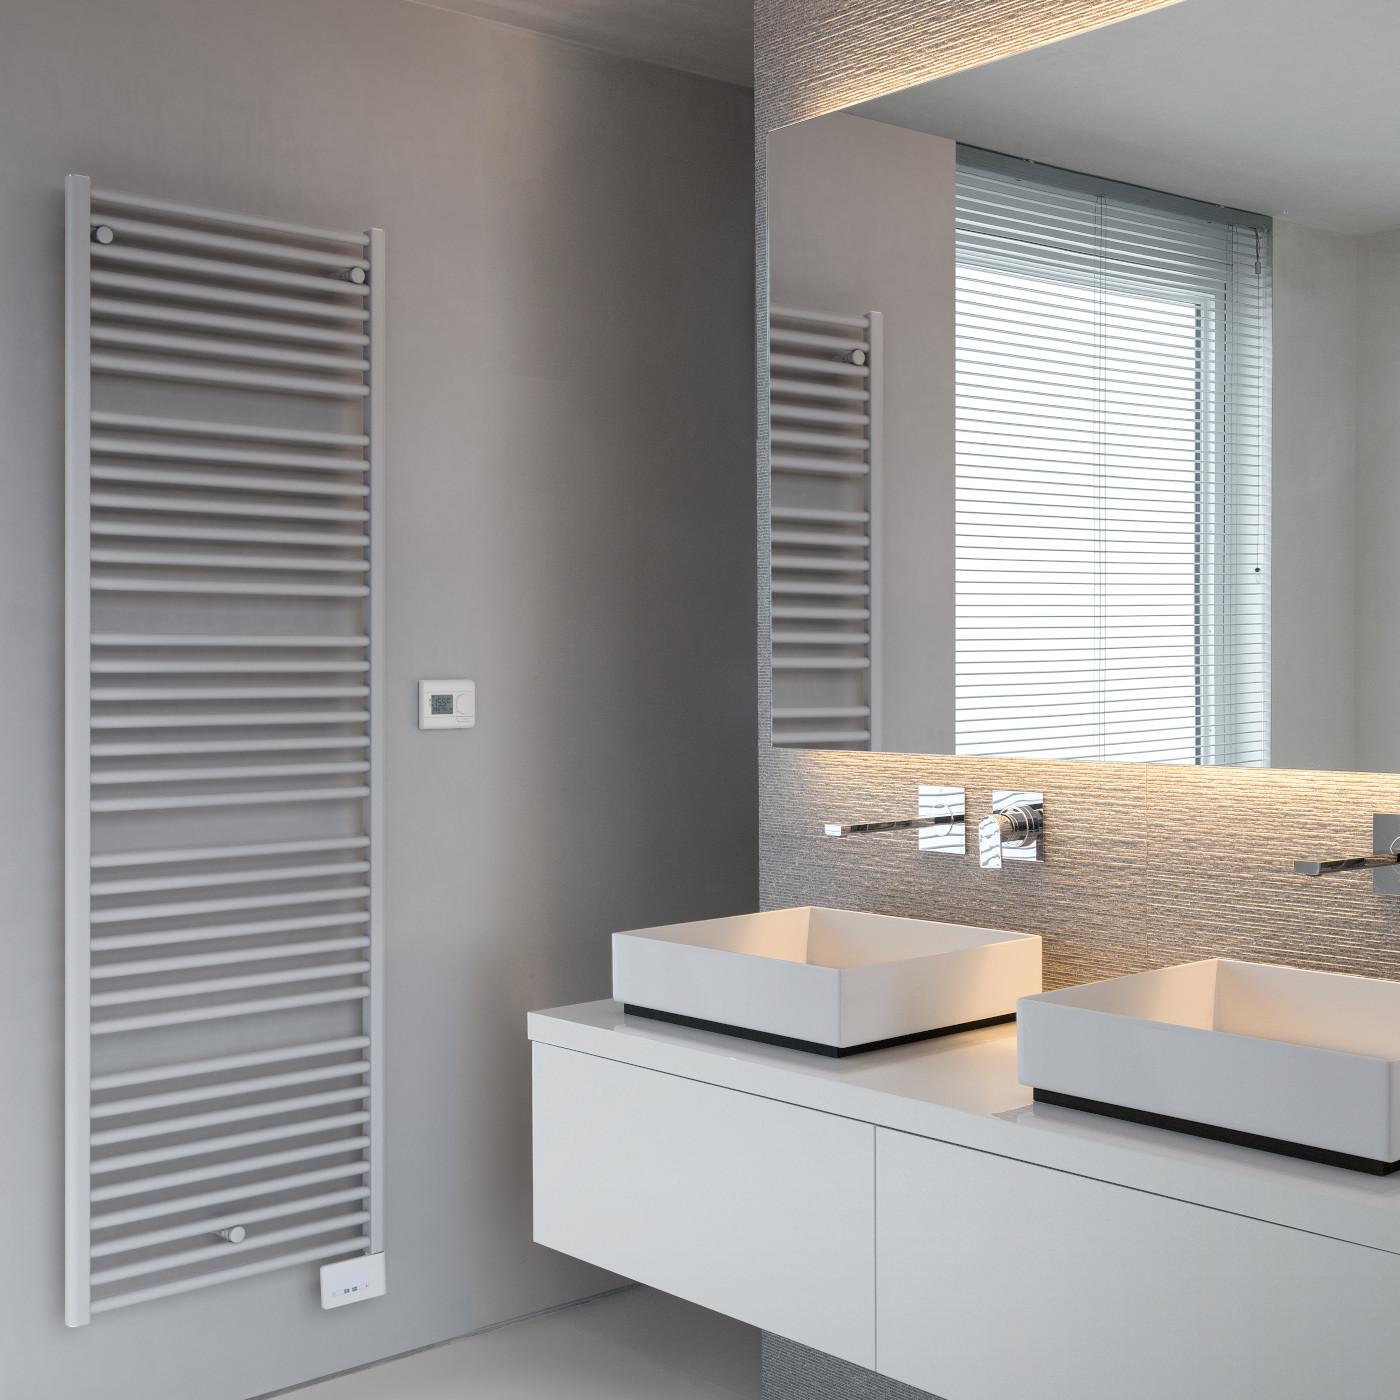 luxe vasco badkamer in stijl